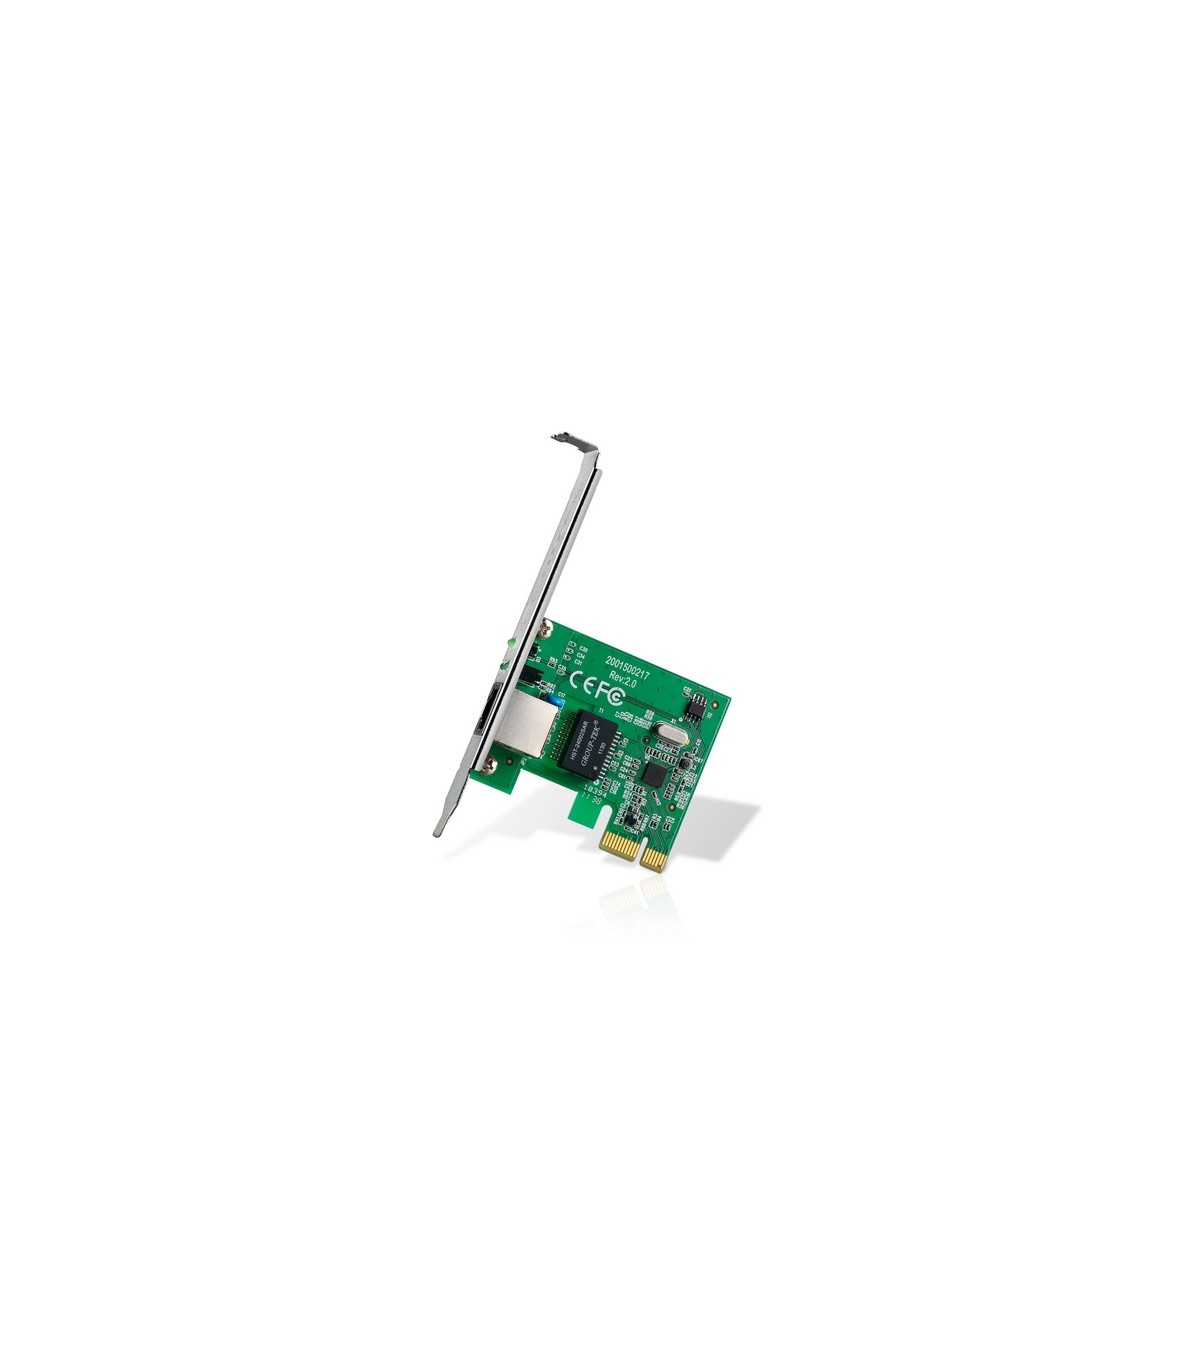 SCHEDA DI RETE TP-LINK PCI-EXP. GIGABIT